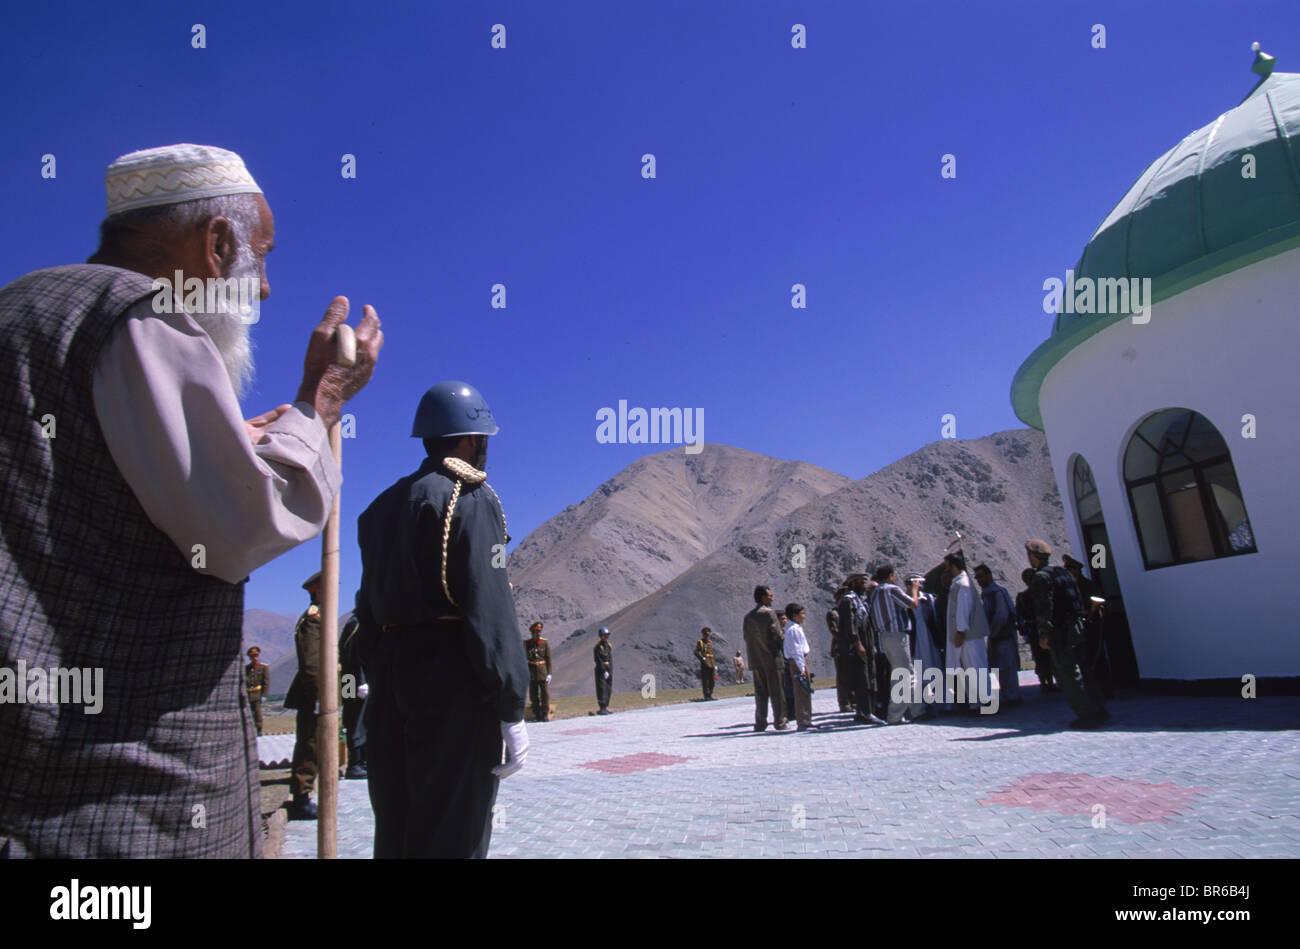 An elderly man prays outside the shrine of Ahmad Shah Masood in the Panjshir Valley. - Stock Image